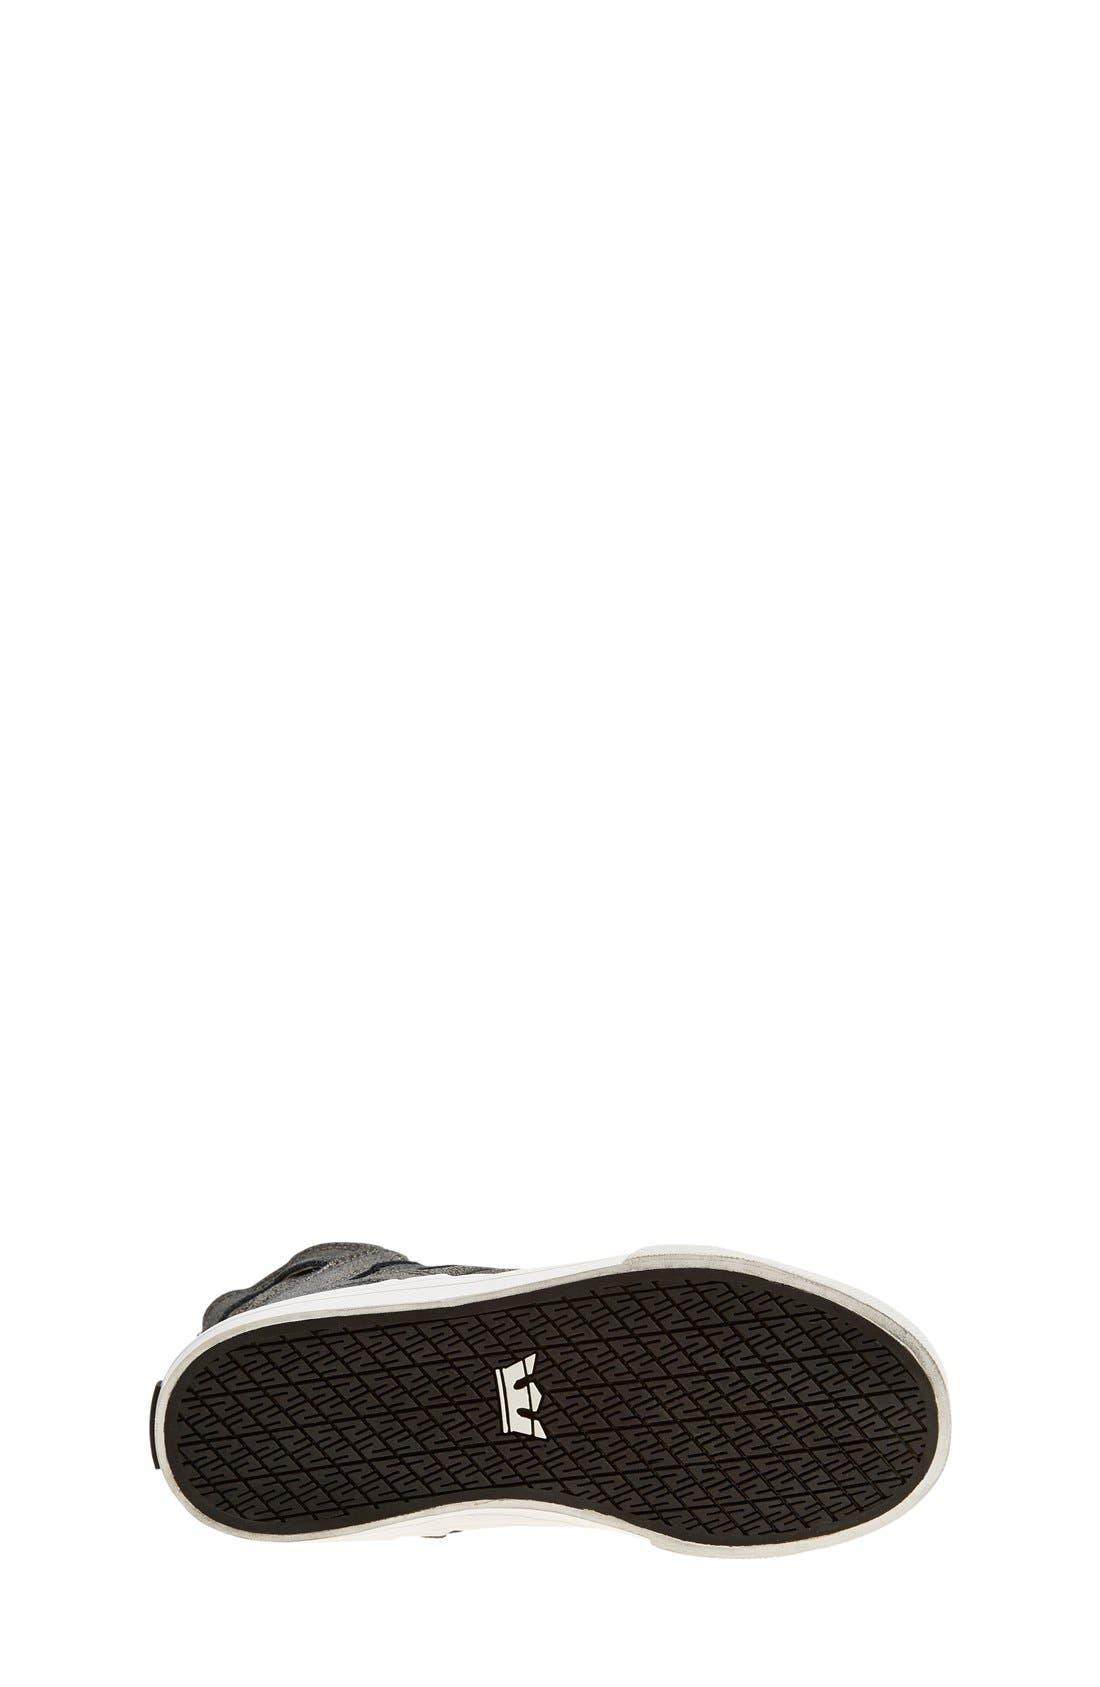 Alternate Image 4  - Supra 'Skytop' High Top Sneaker (Toddler, Little Kid & Big Kid)